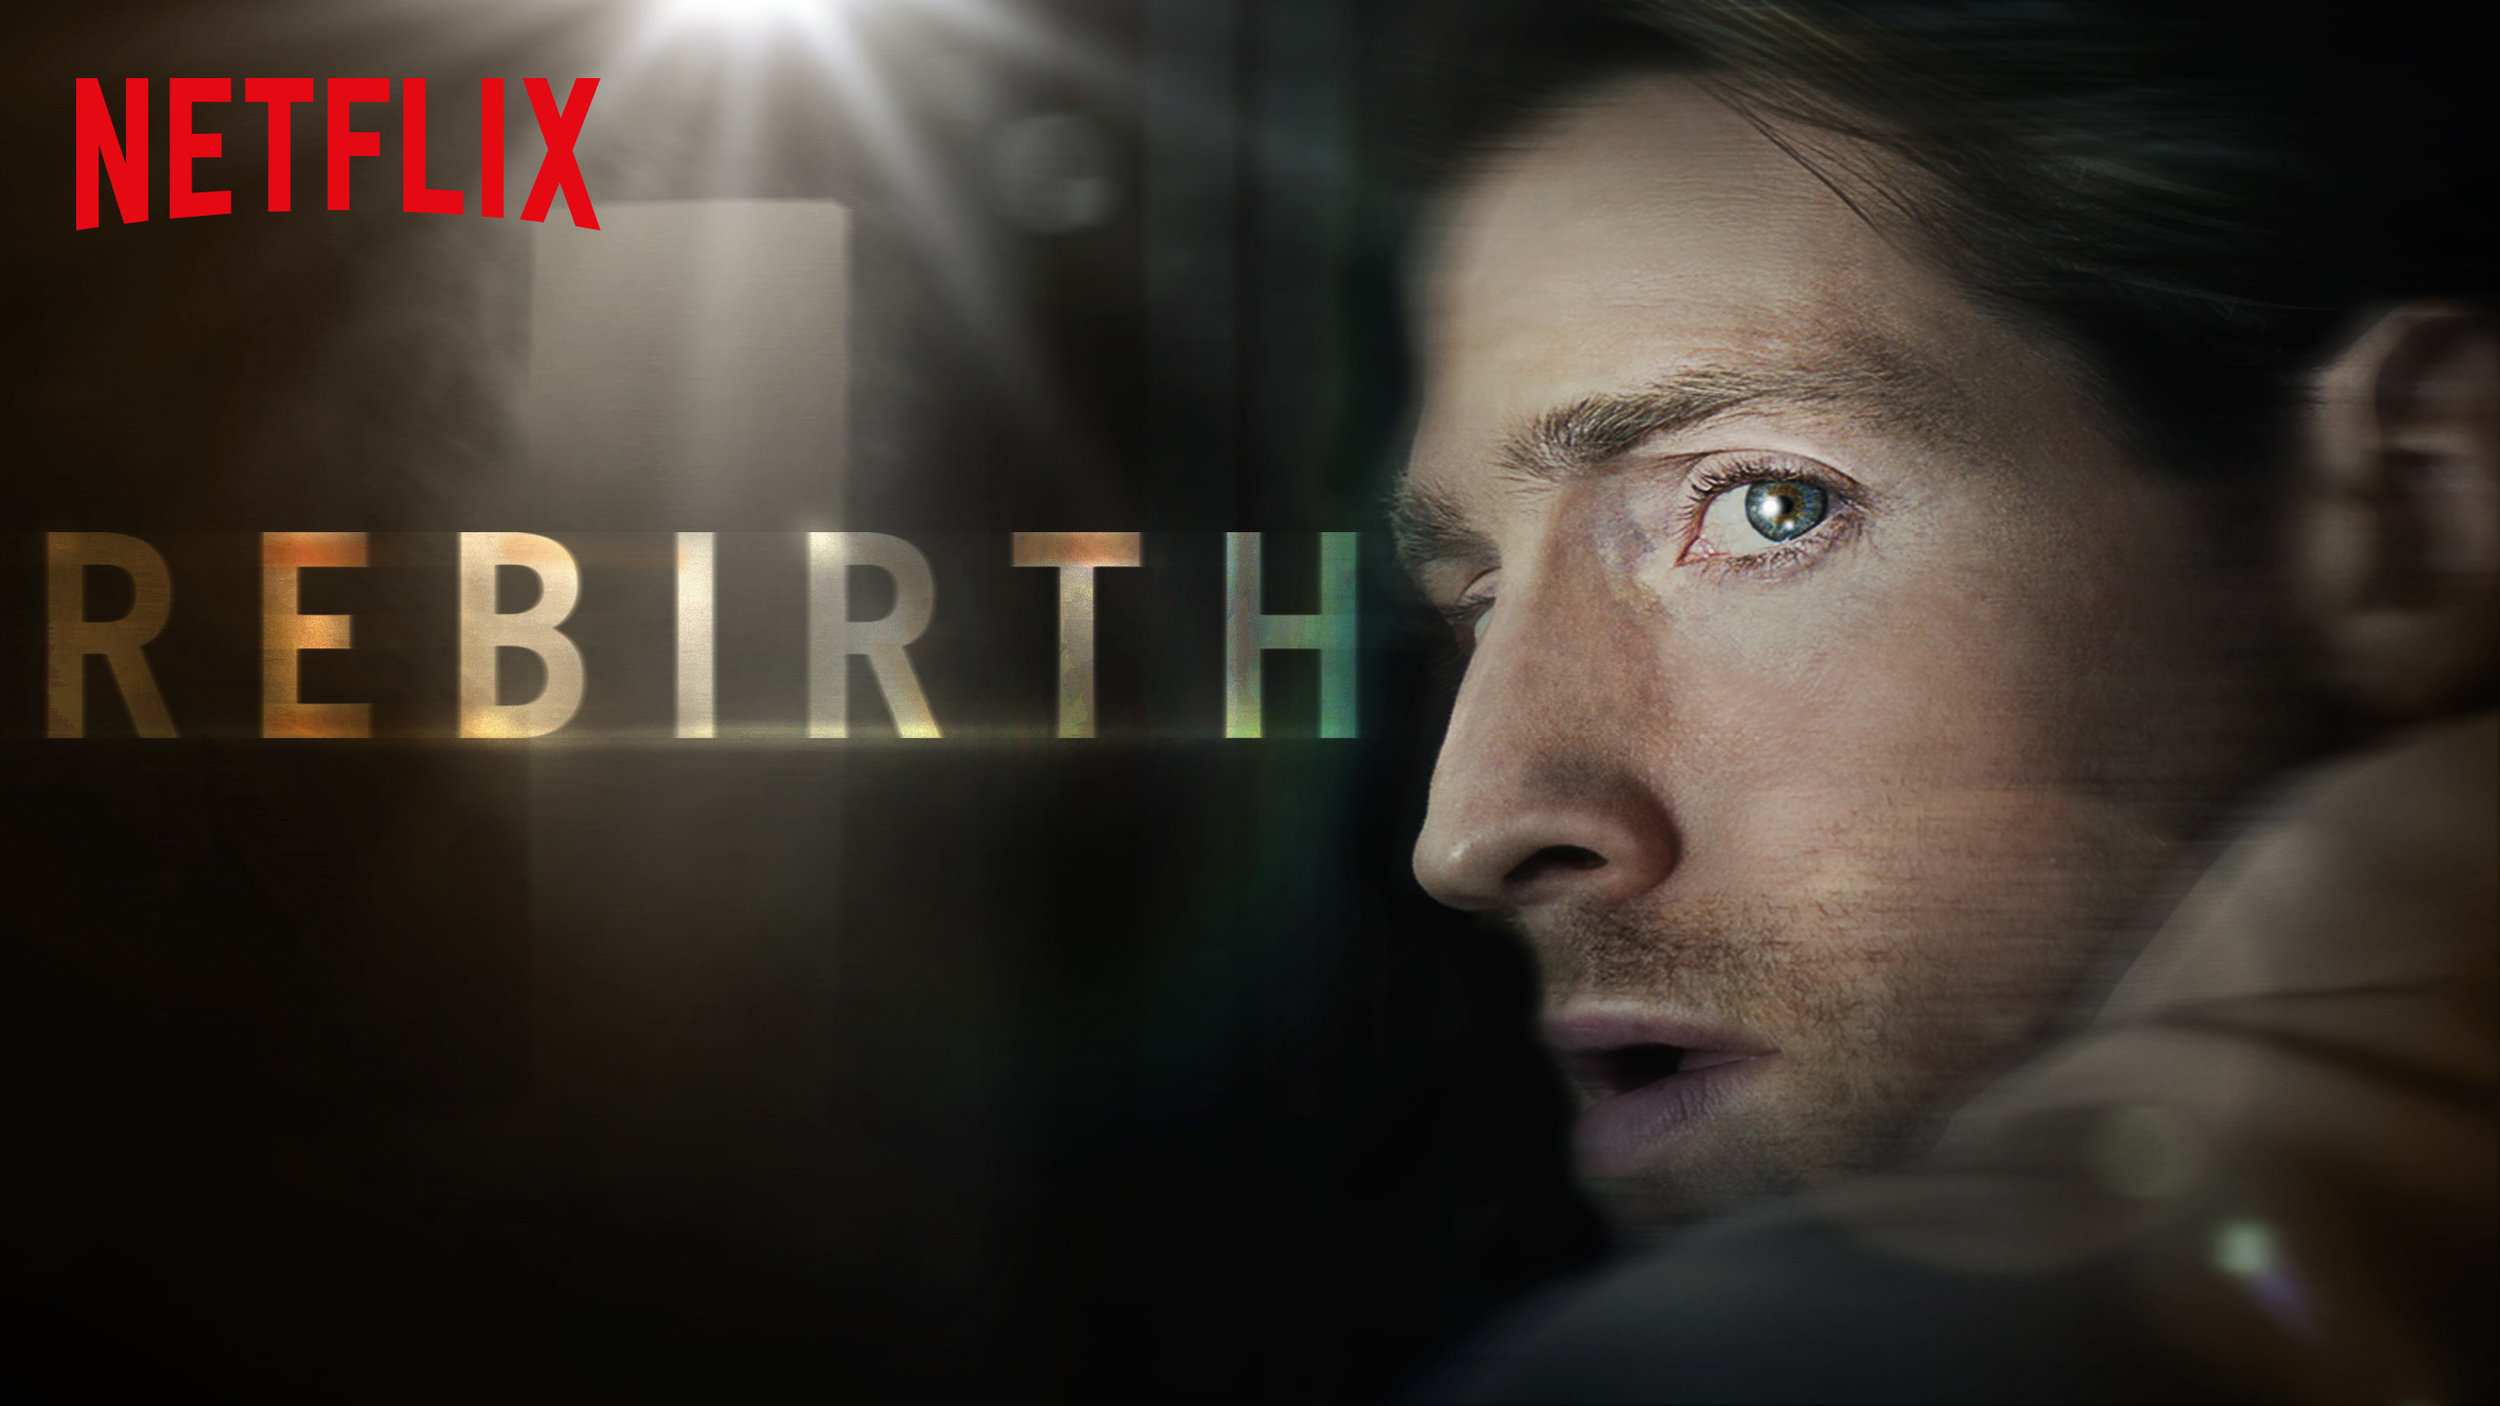 Rebirth_sdp_additional-4_USA_en.jpg